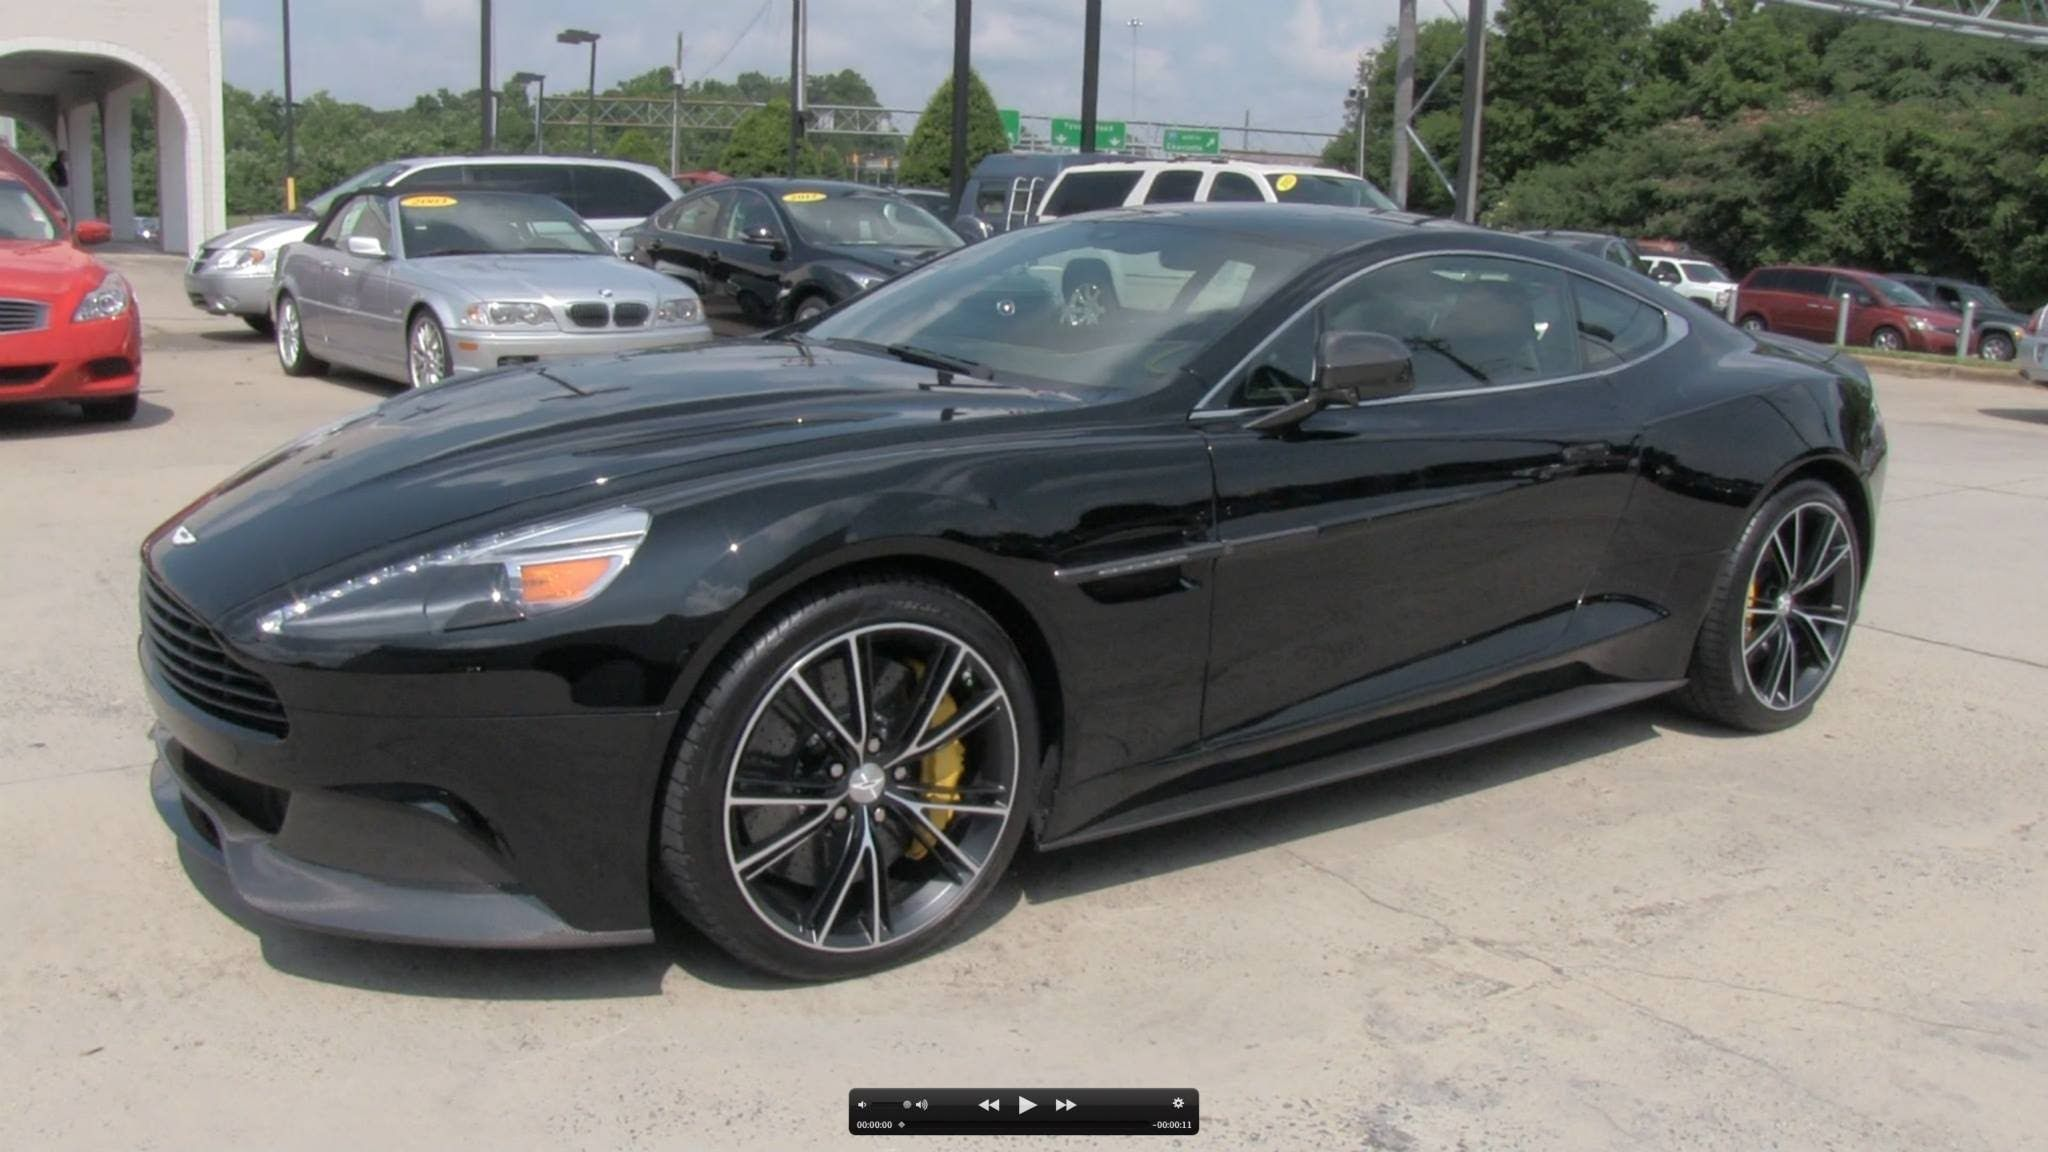 2014 Aston Martin Vanquish V12 Start Up Exhaust And In Depth Review Aston Martin Vanquish Aston Martin Aston Martin V12